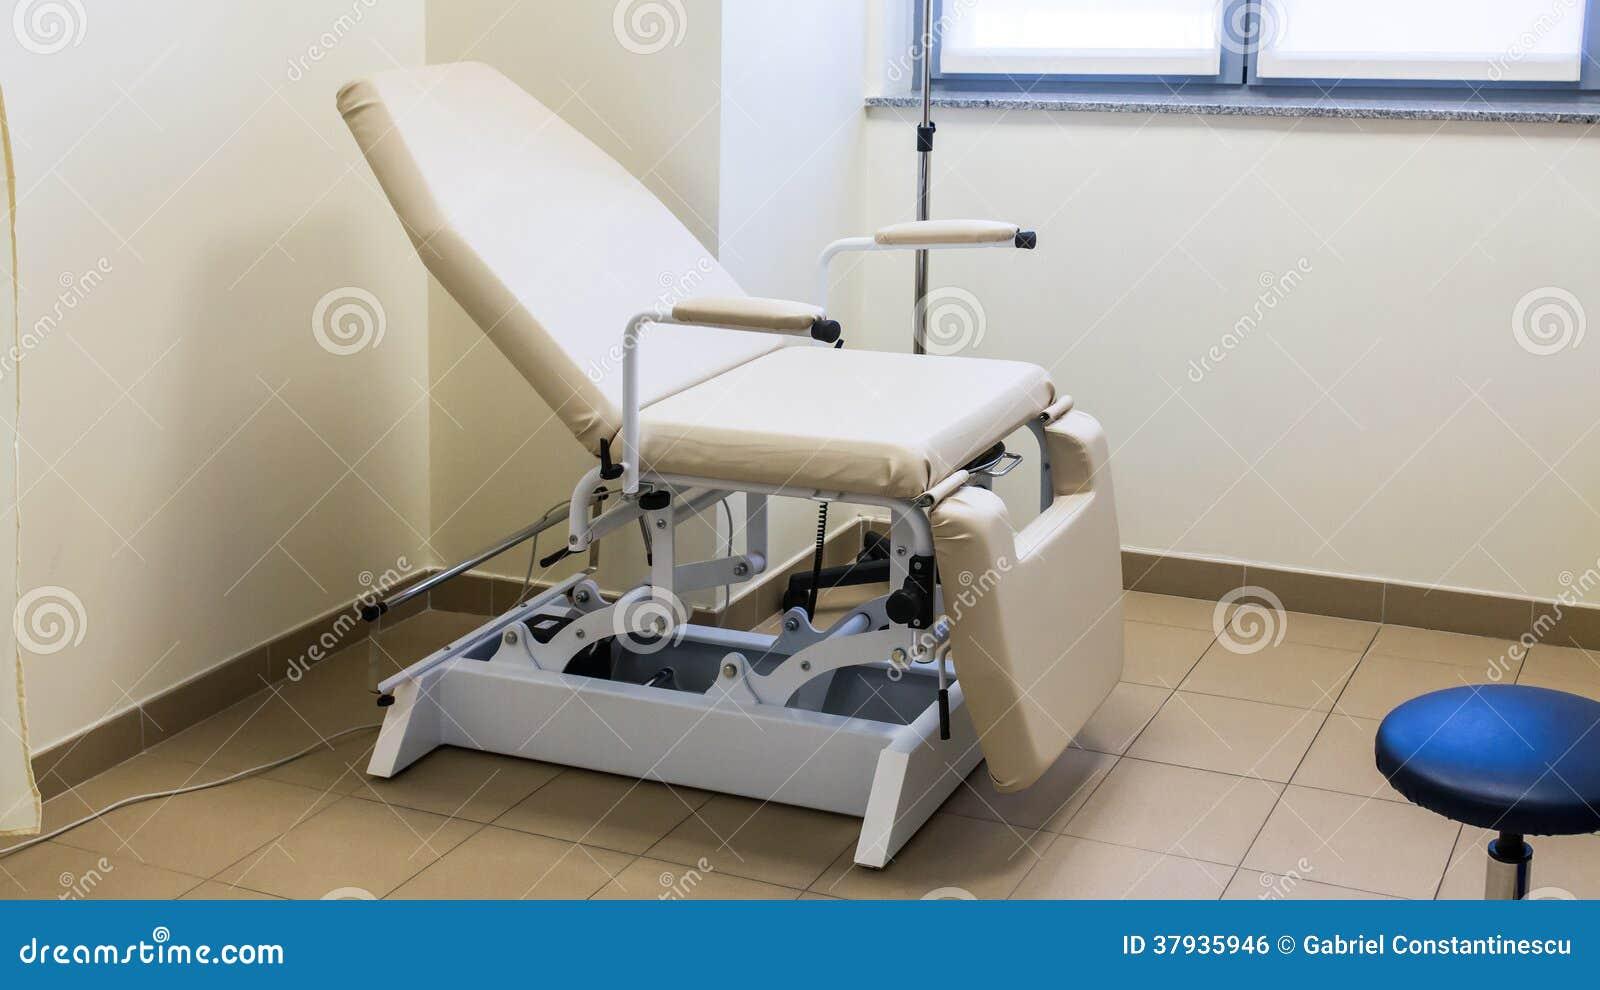 Hospital room obgyn chair